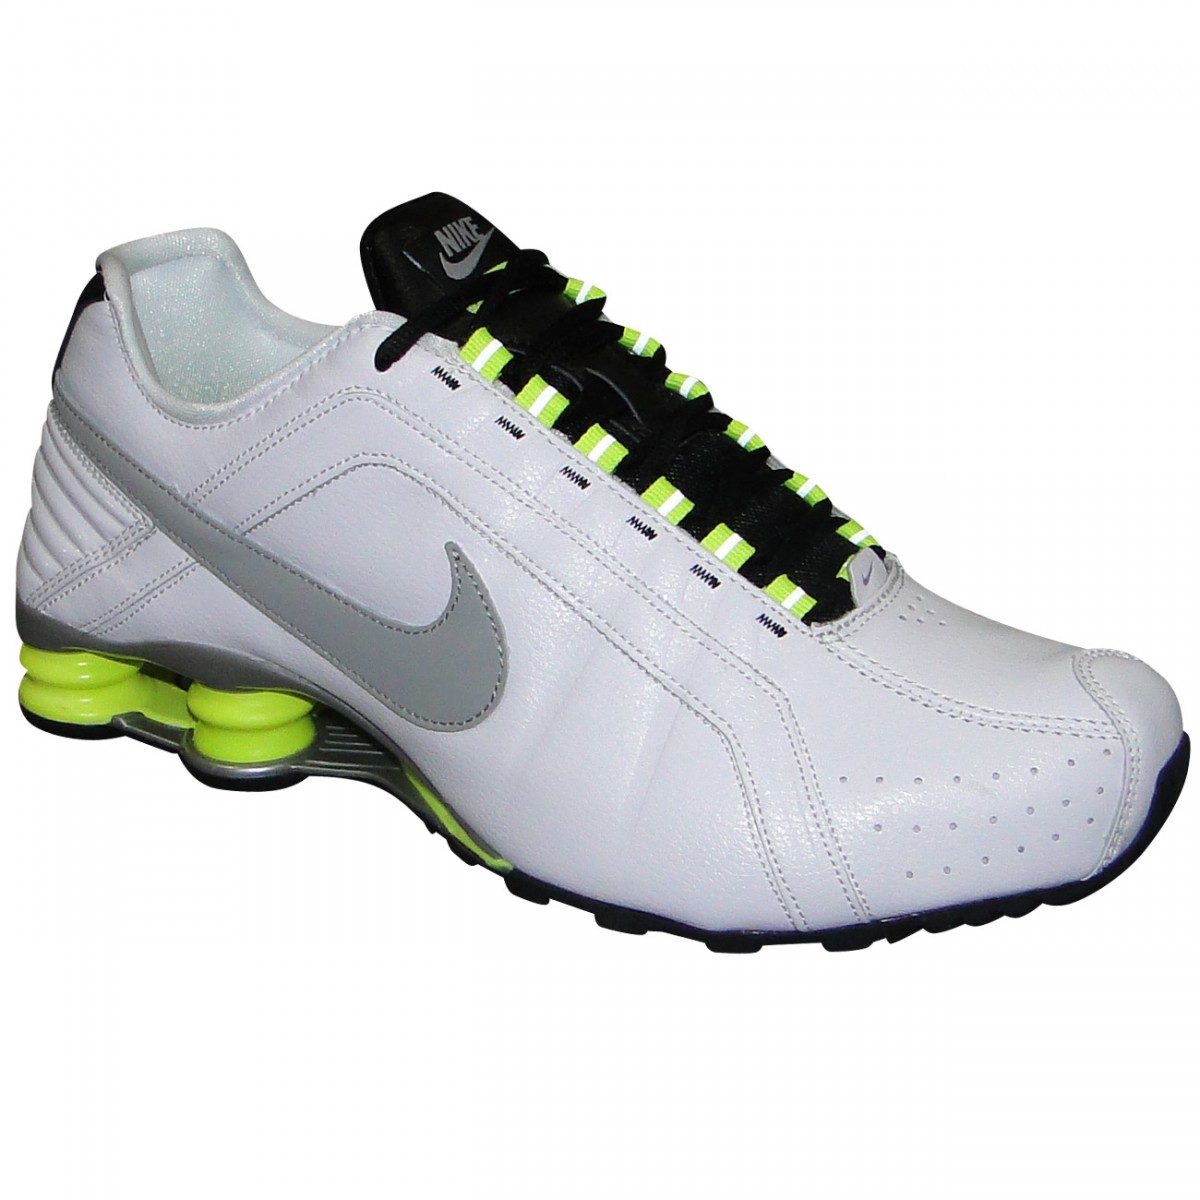 b6cf8c14a79 Tenis Nike Shox Junior 454340 108 - Branco Cinza Limão - Chuteira ...